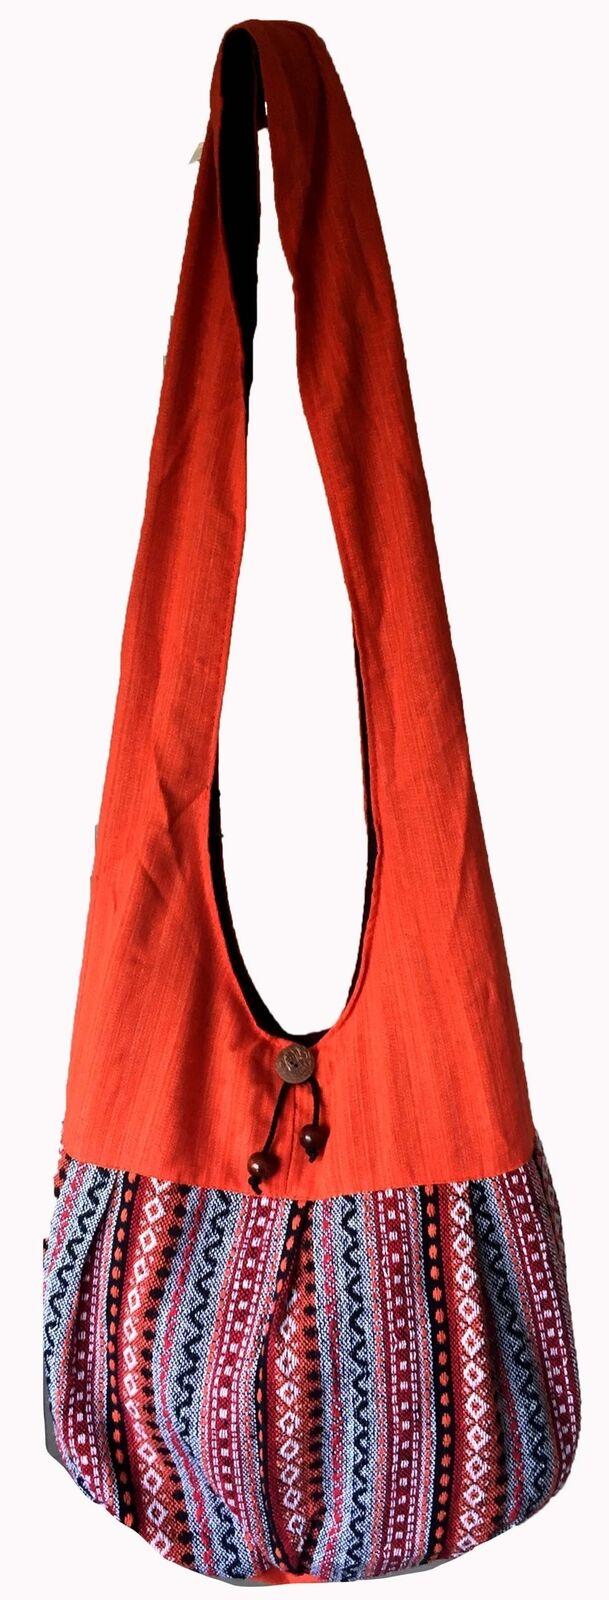 Shoulder bag Women - Crossbody bags - Hippie boho bag Ethnic Sling Cotton Hippy